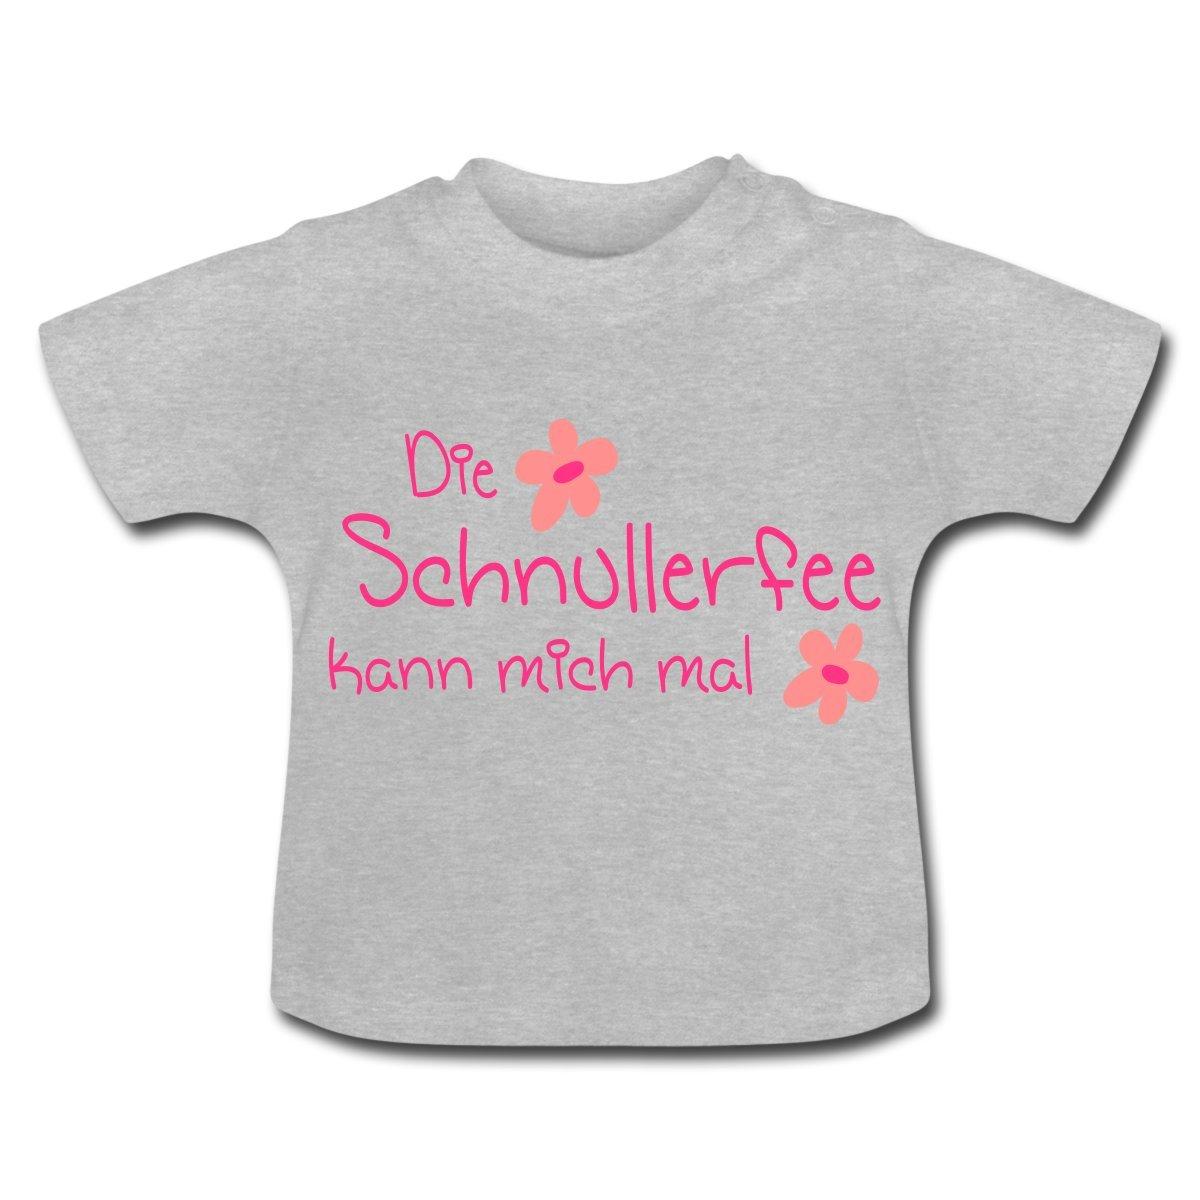 La Chupete Hada kann mich mal Baby - Camiseta de Spread Gris ...